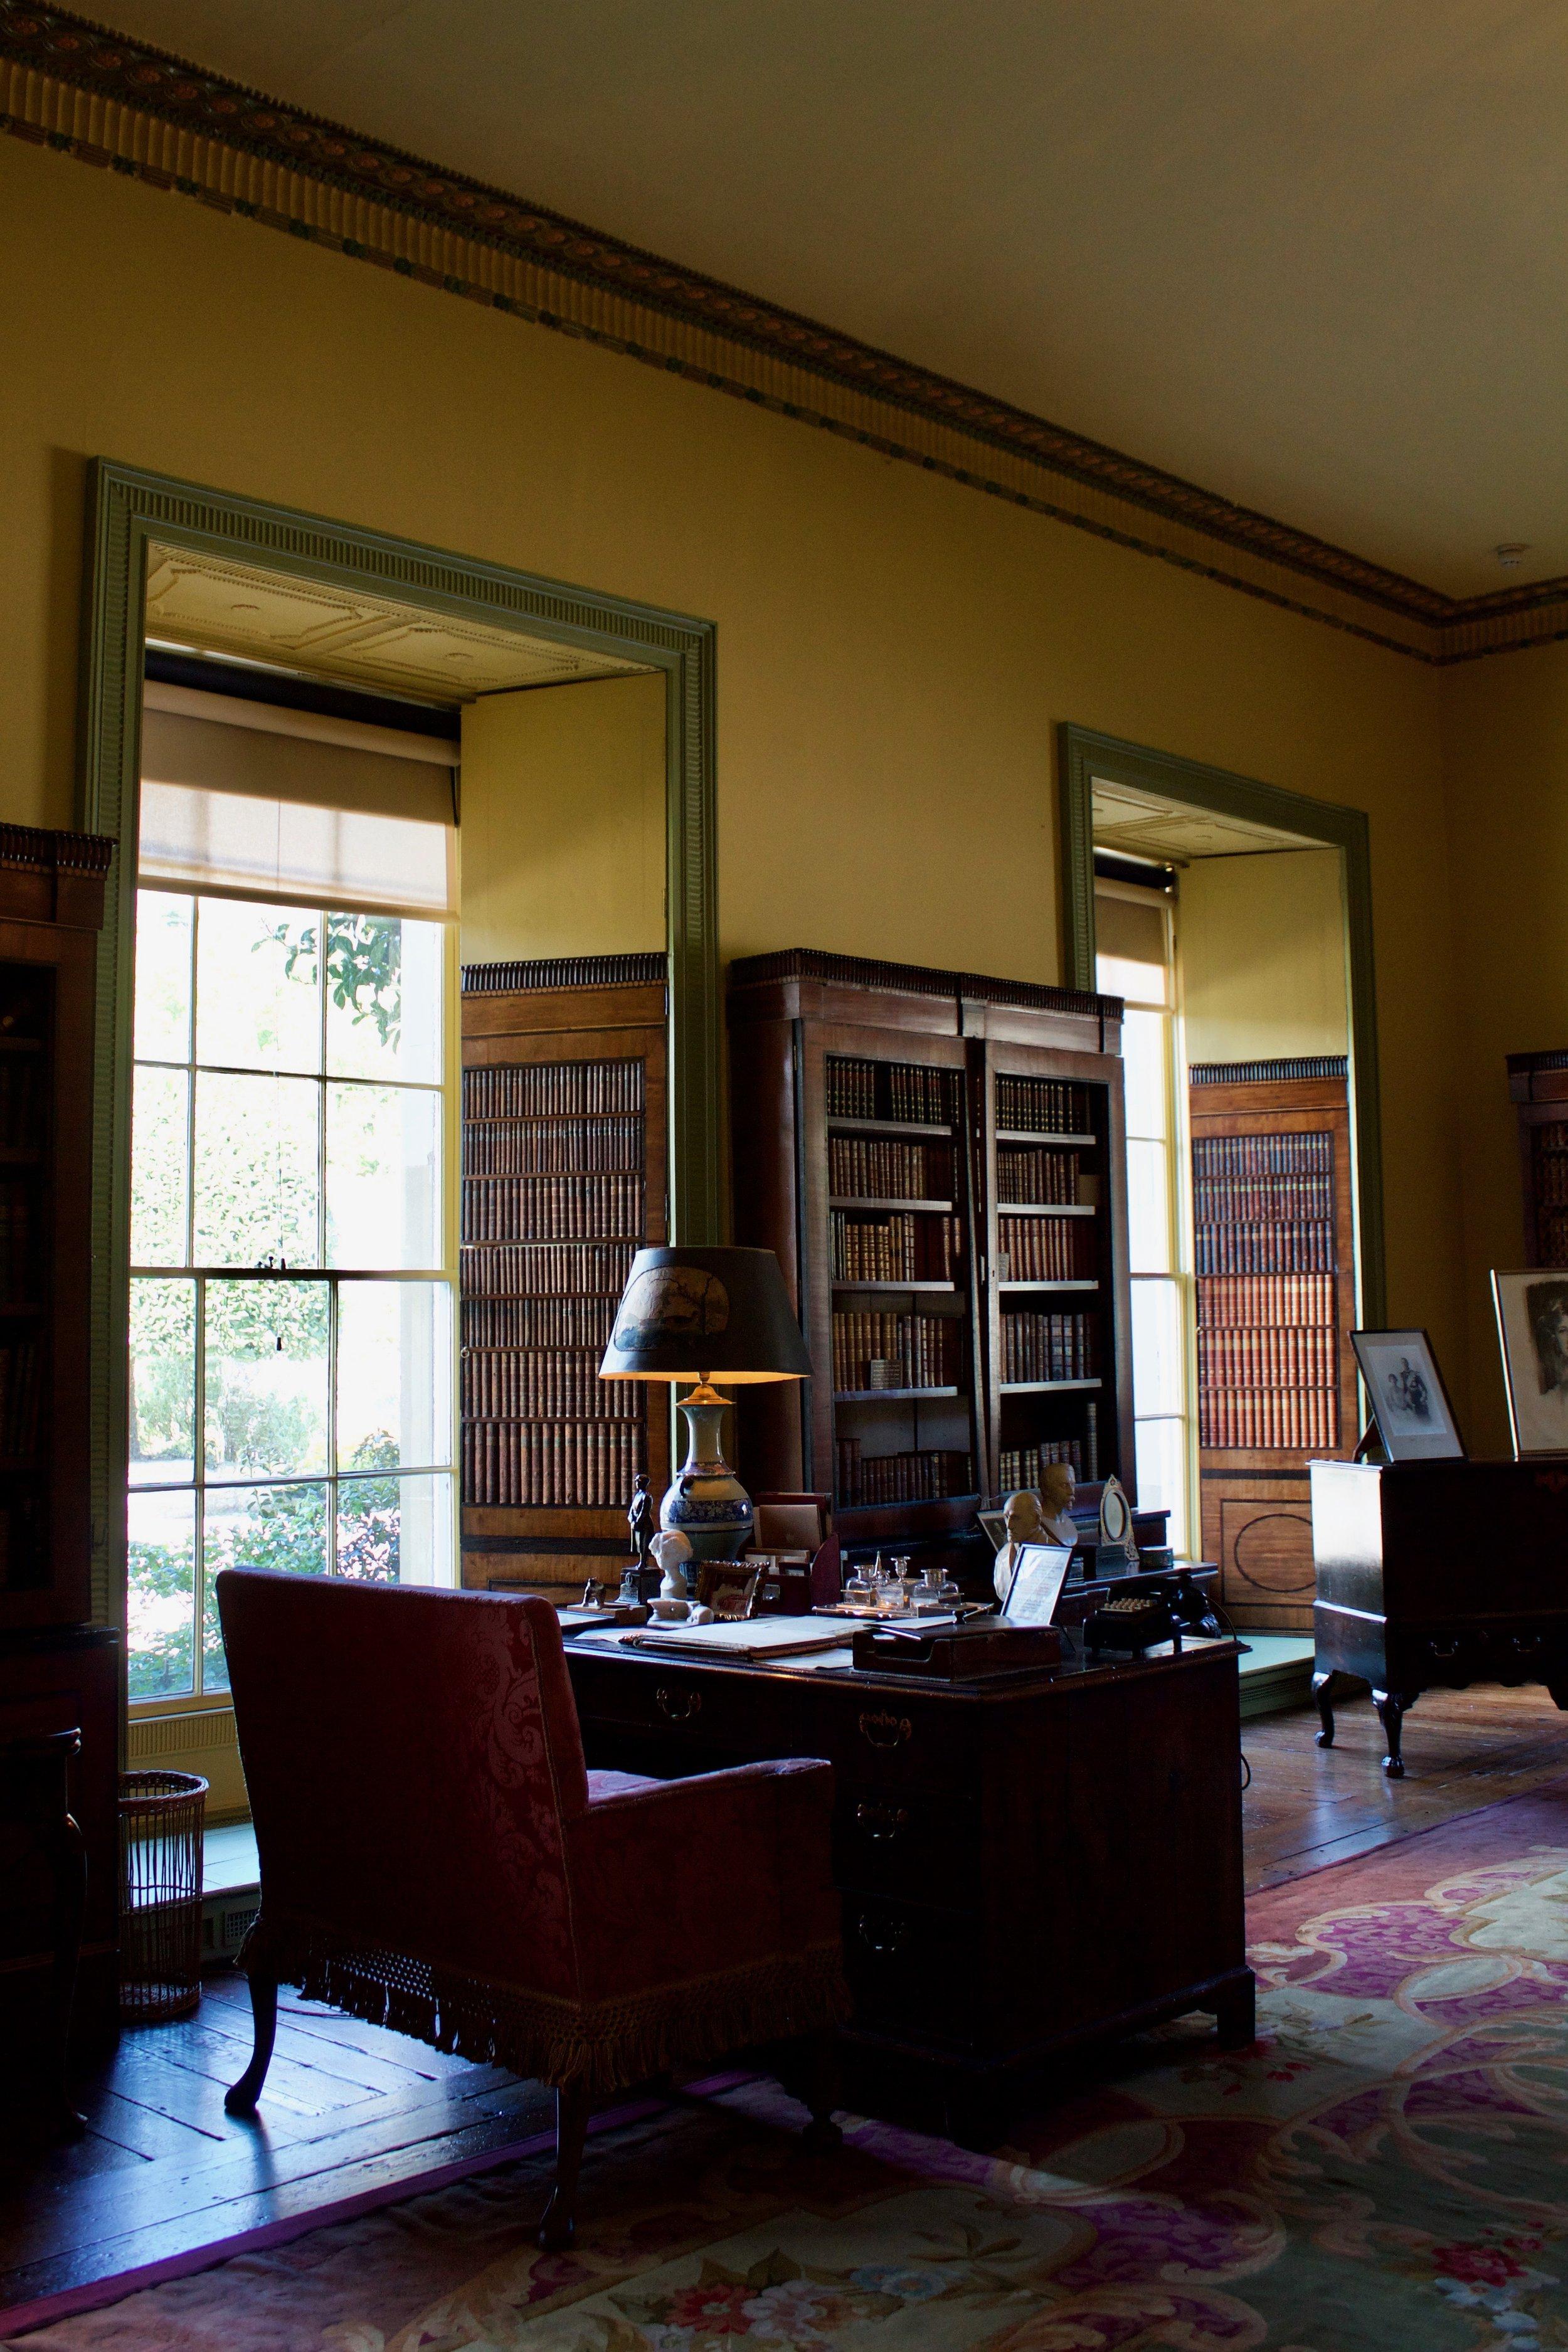 Mount_Stewart_Library.jpg